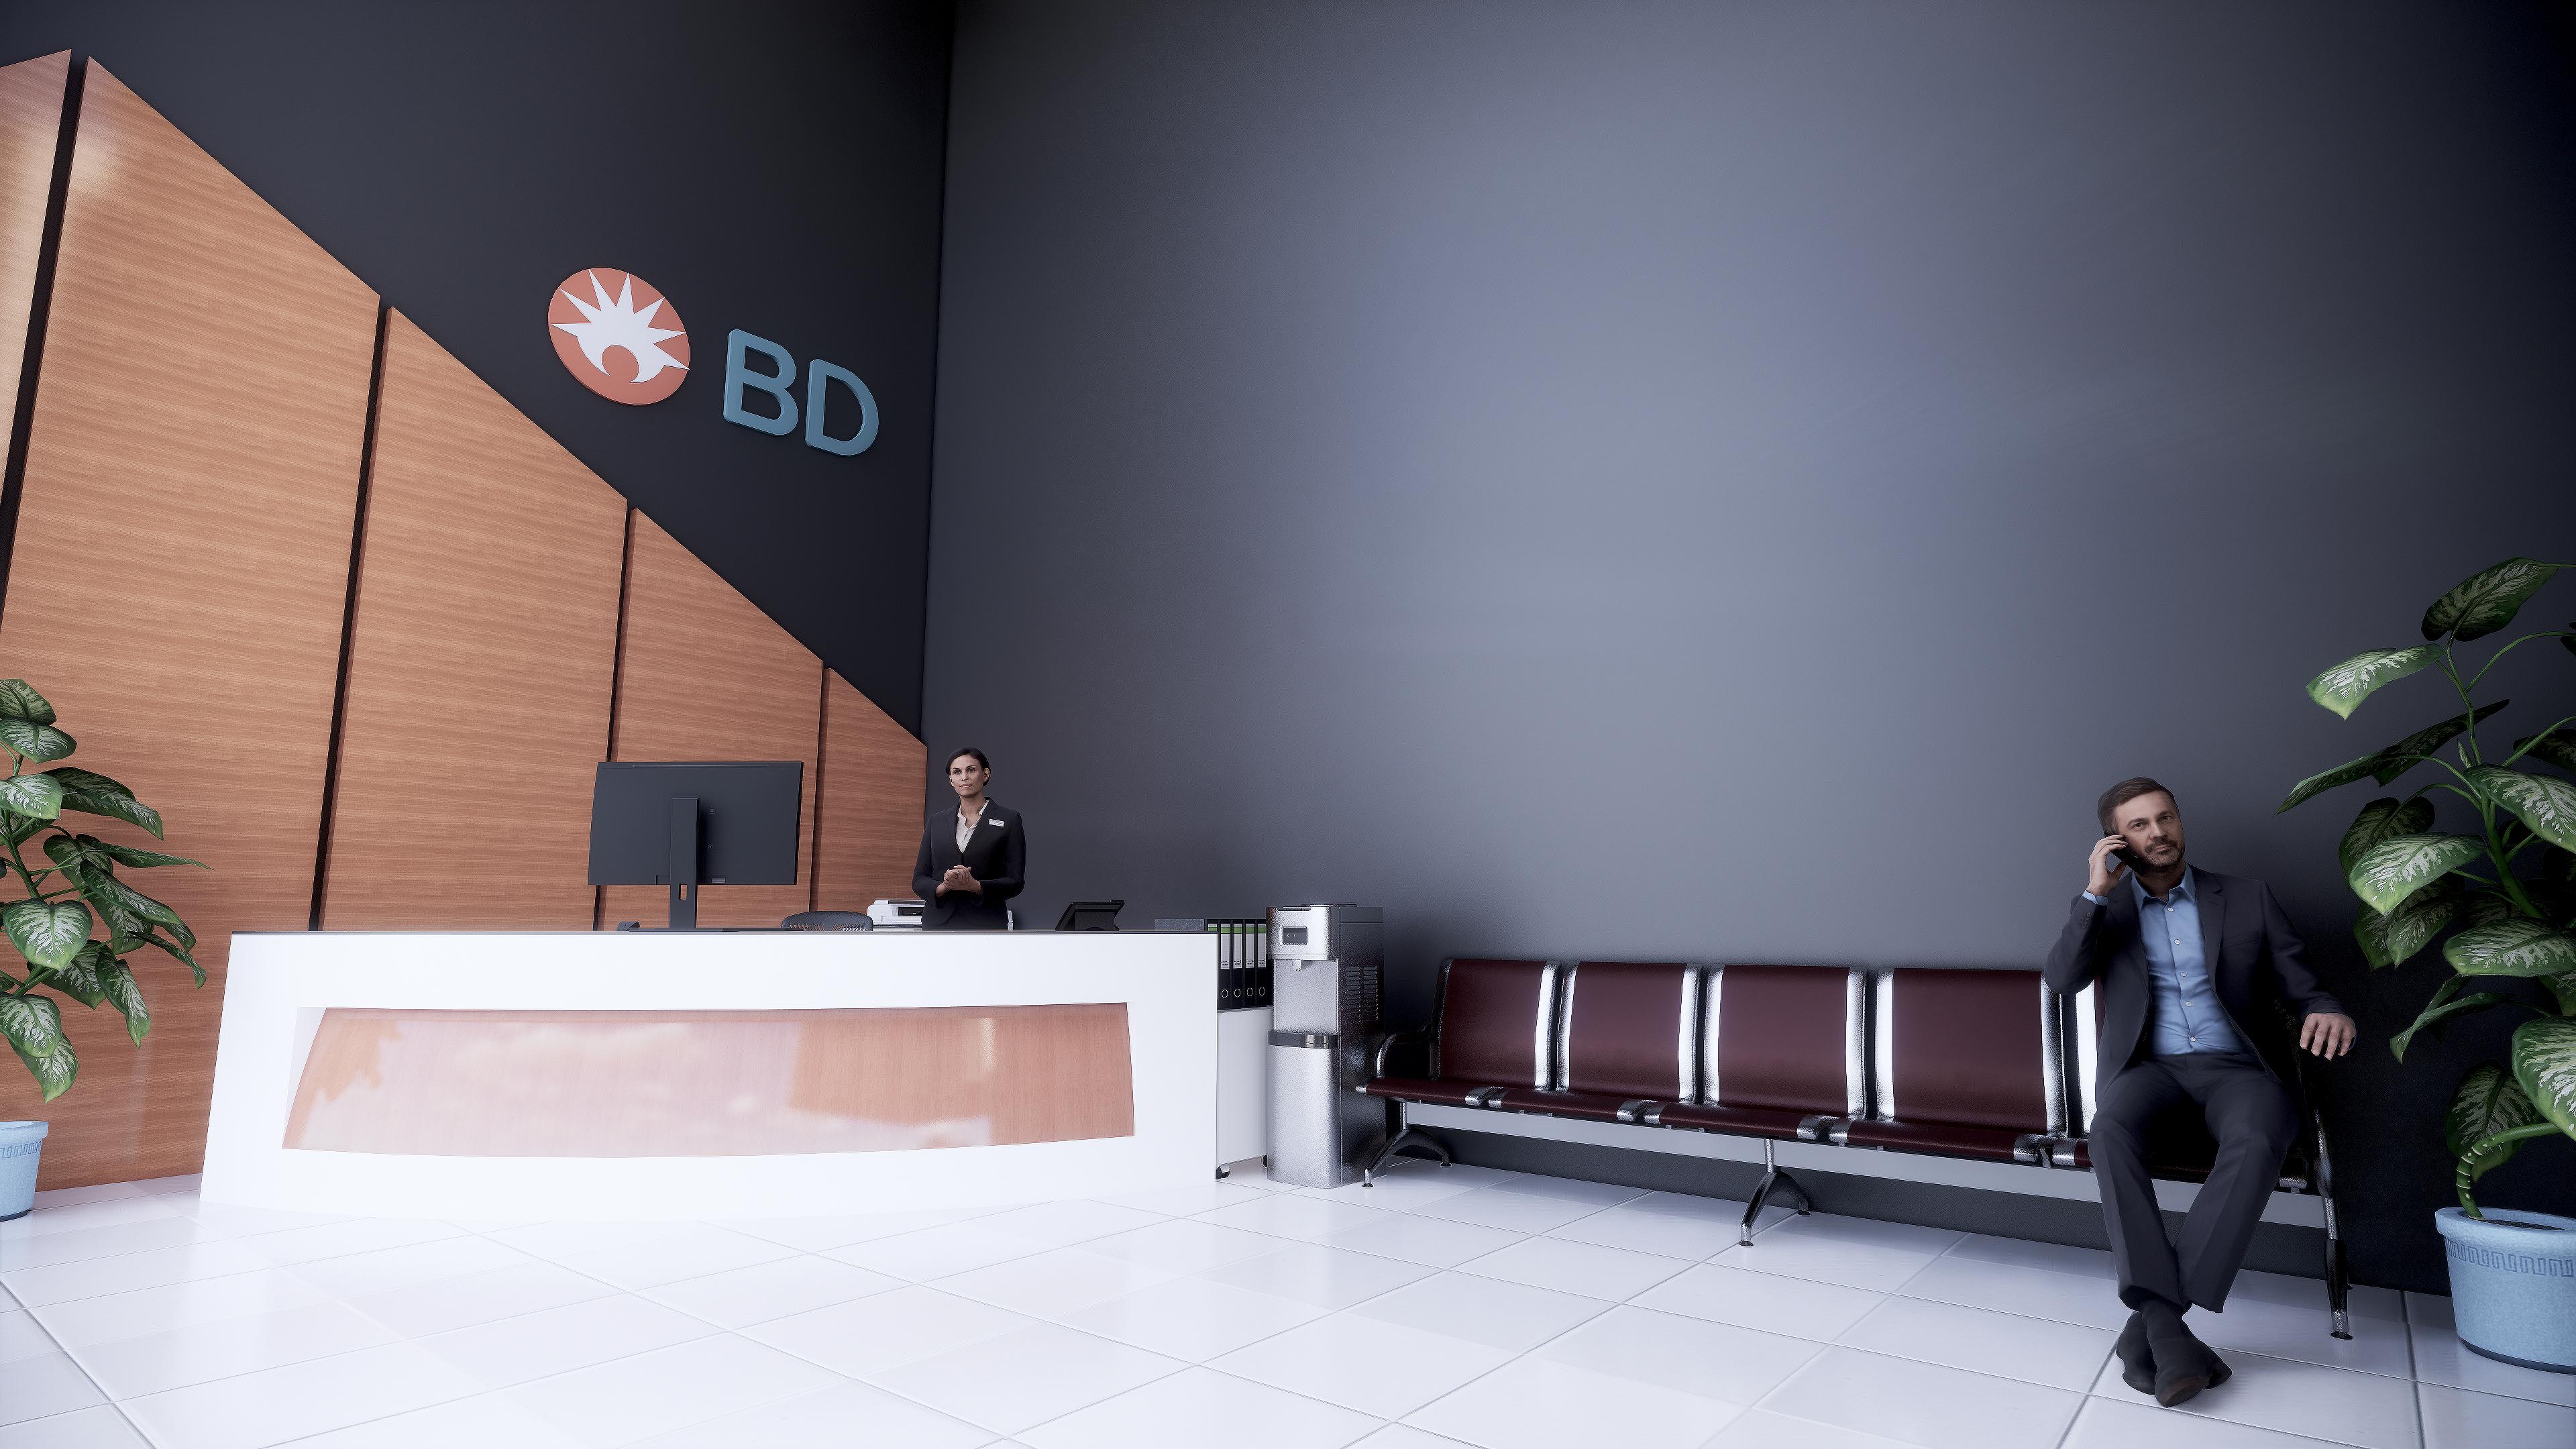 Office 3D Rendering BIM